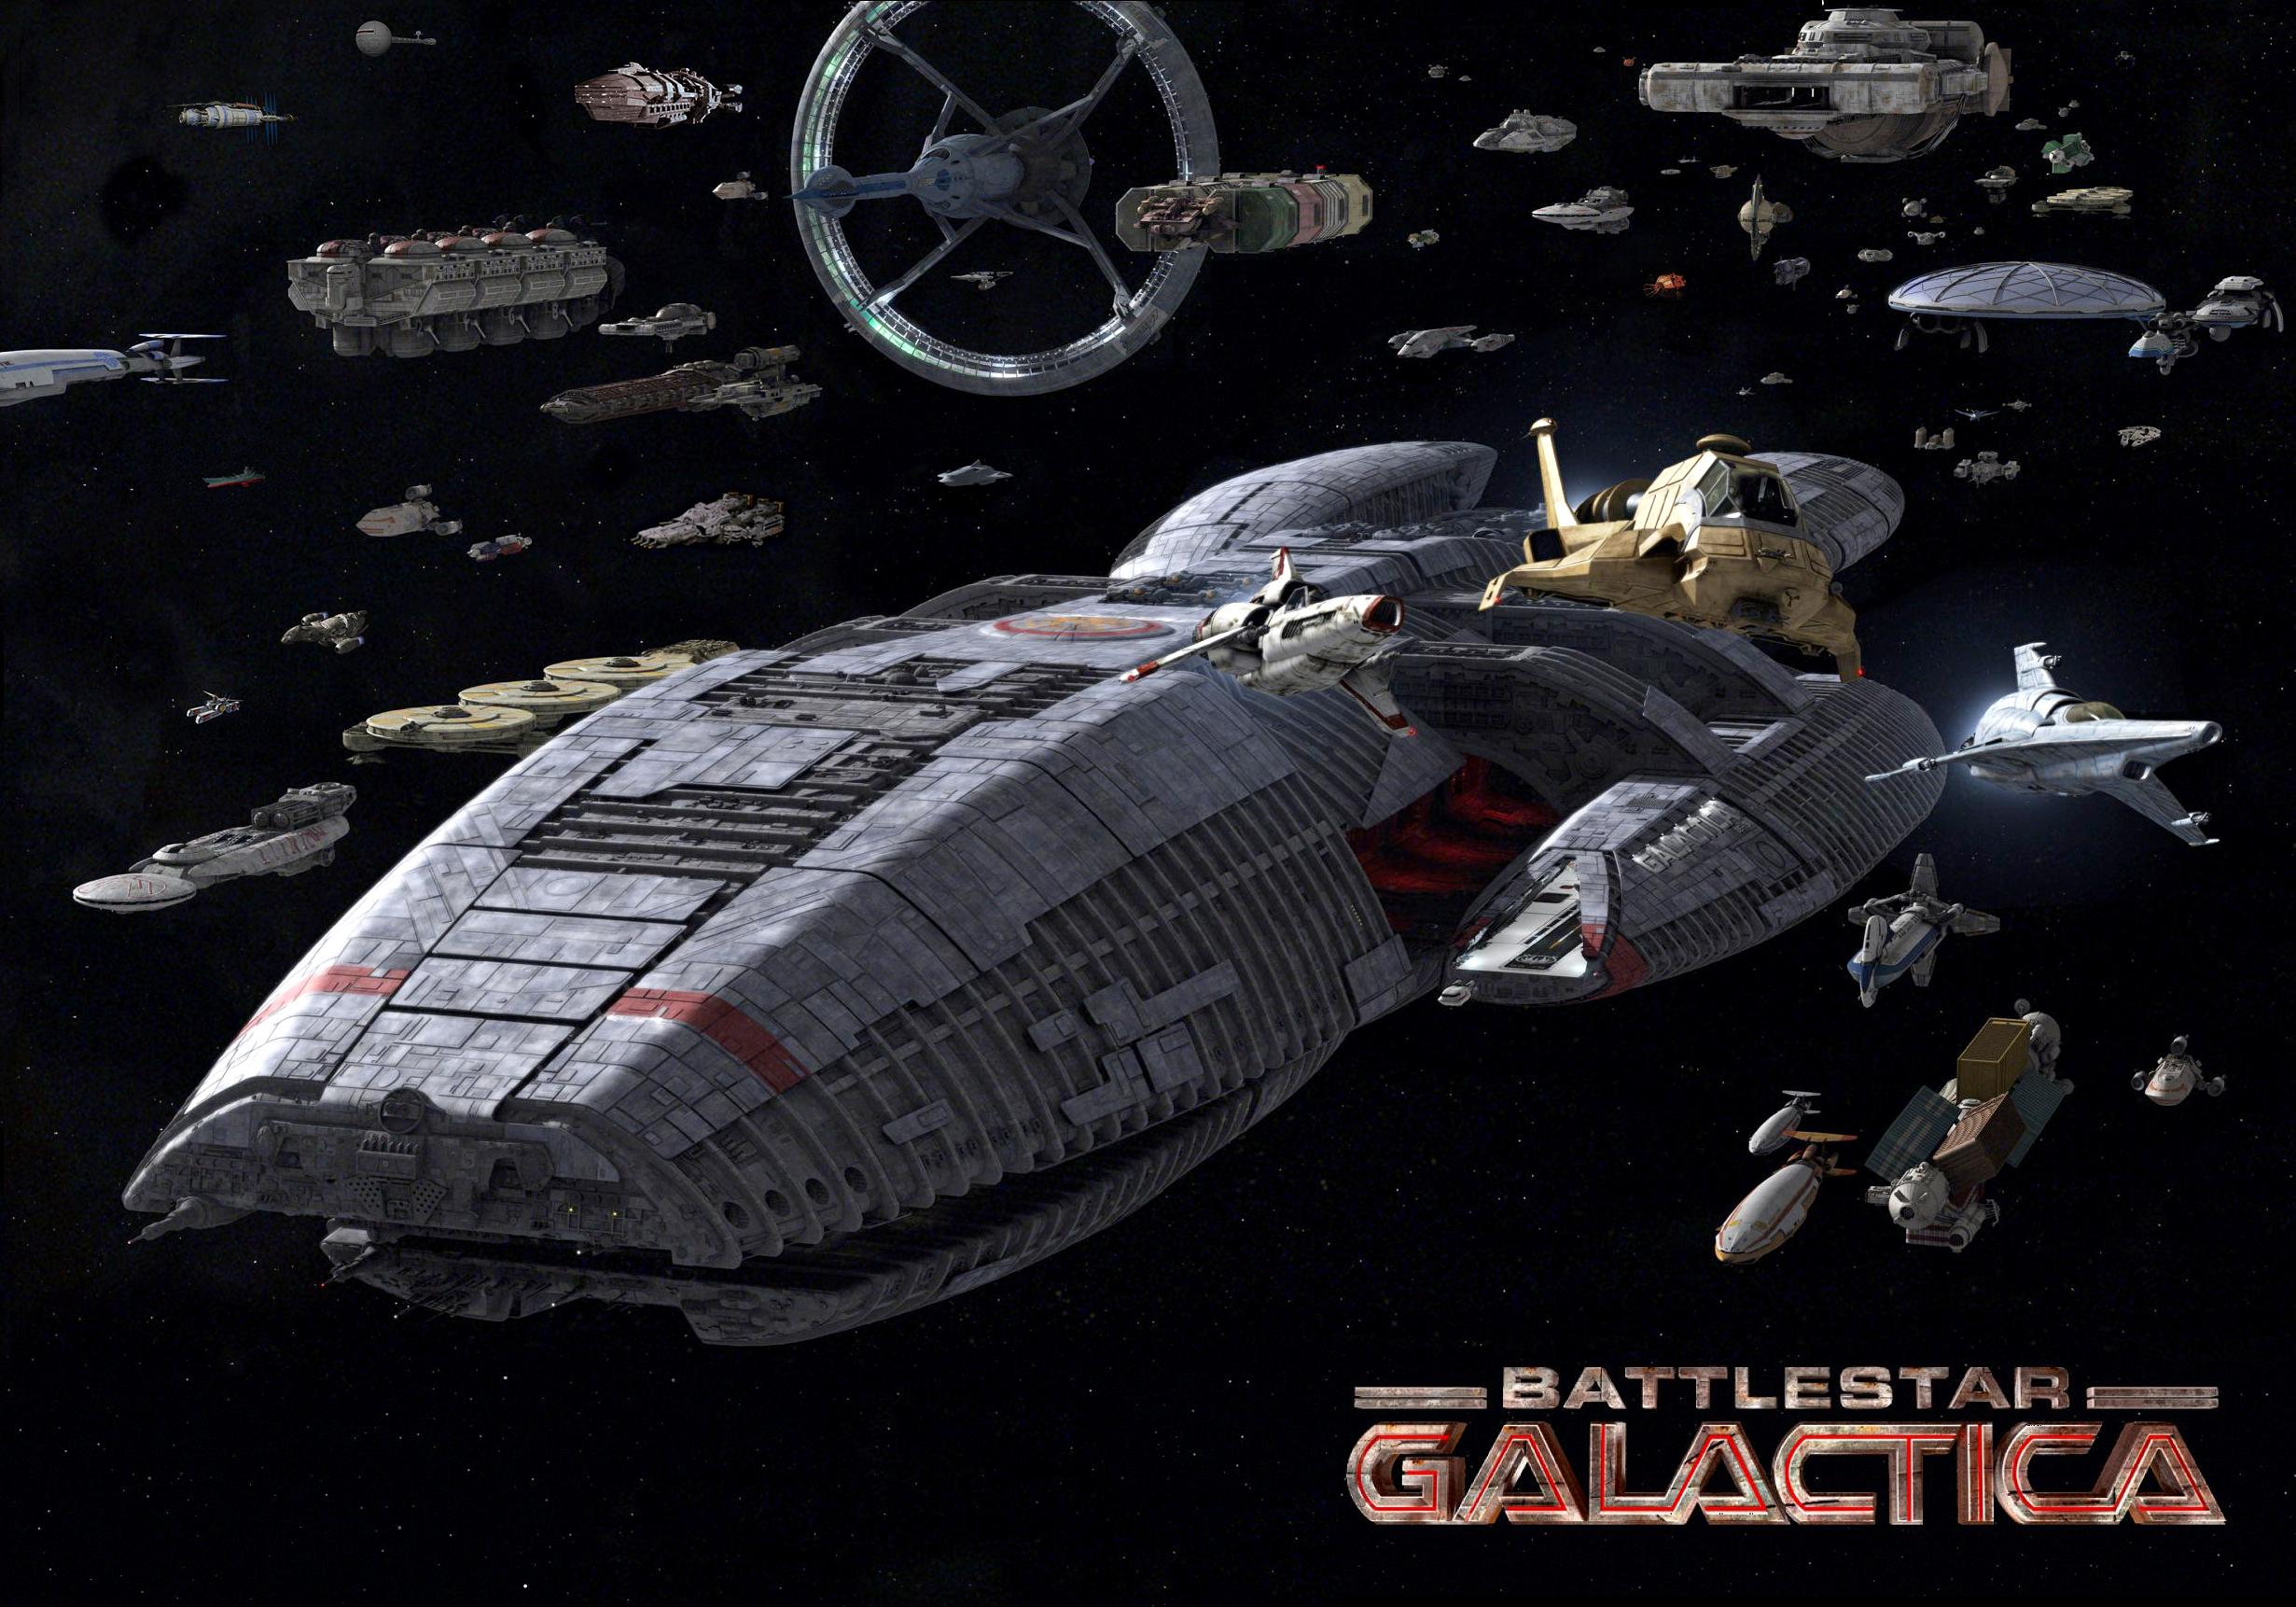 battlestar galactica wallpaper